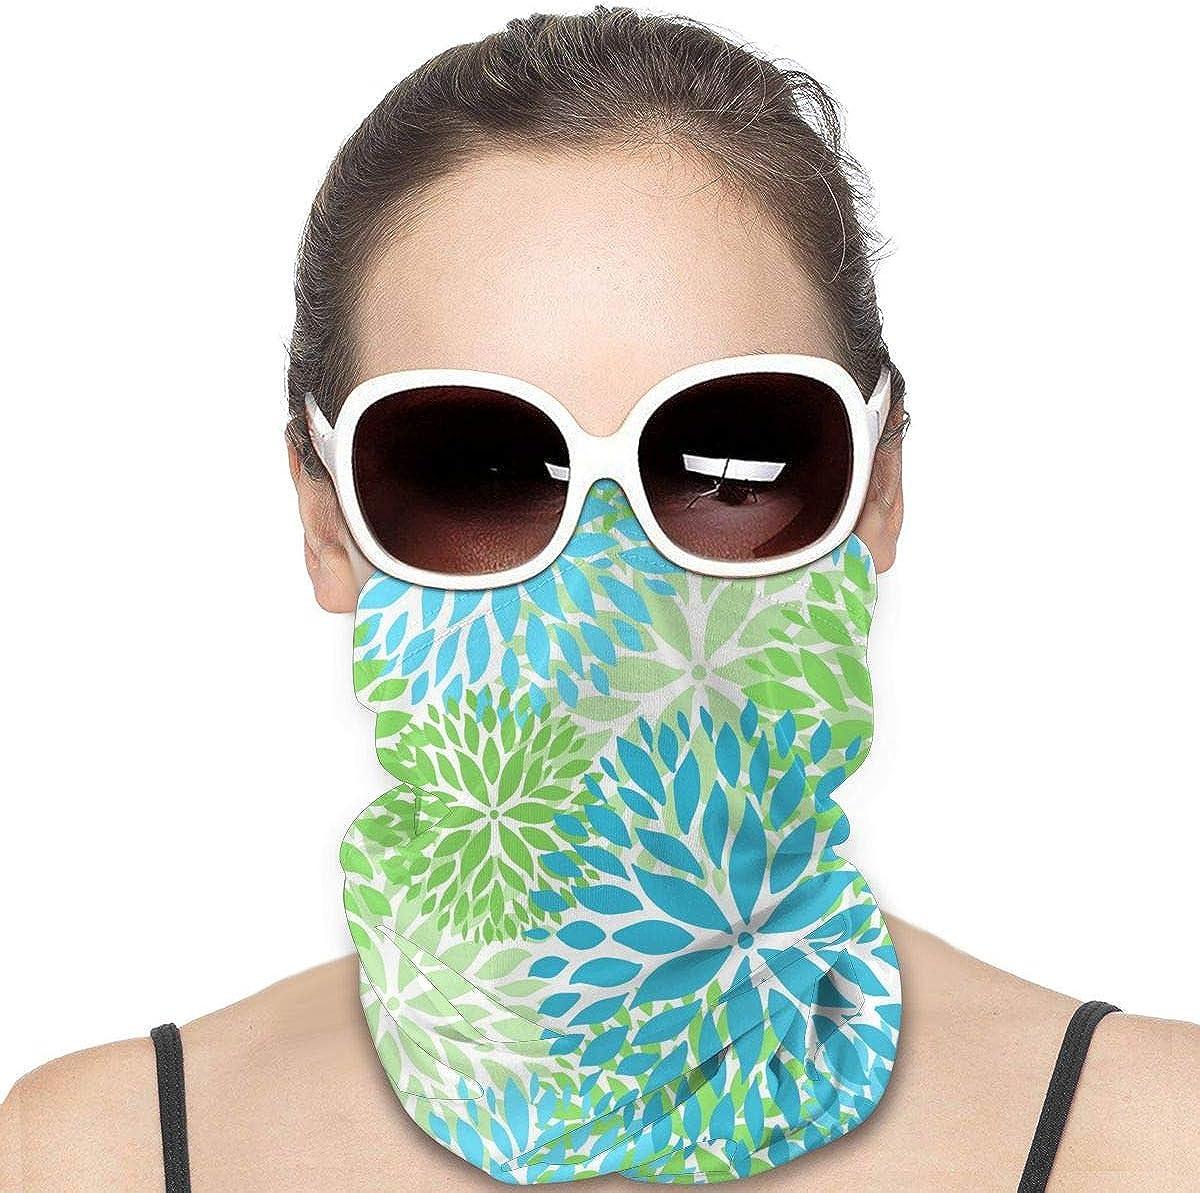 KiuLoam Women Bandanas Face Mask, Blue and Green Chrysanthemums Flowers Neck Gaiter Mask Headband for Men Face Scarf Dust, Outdoors, Sports